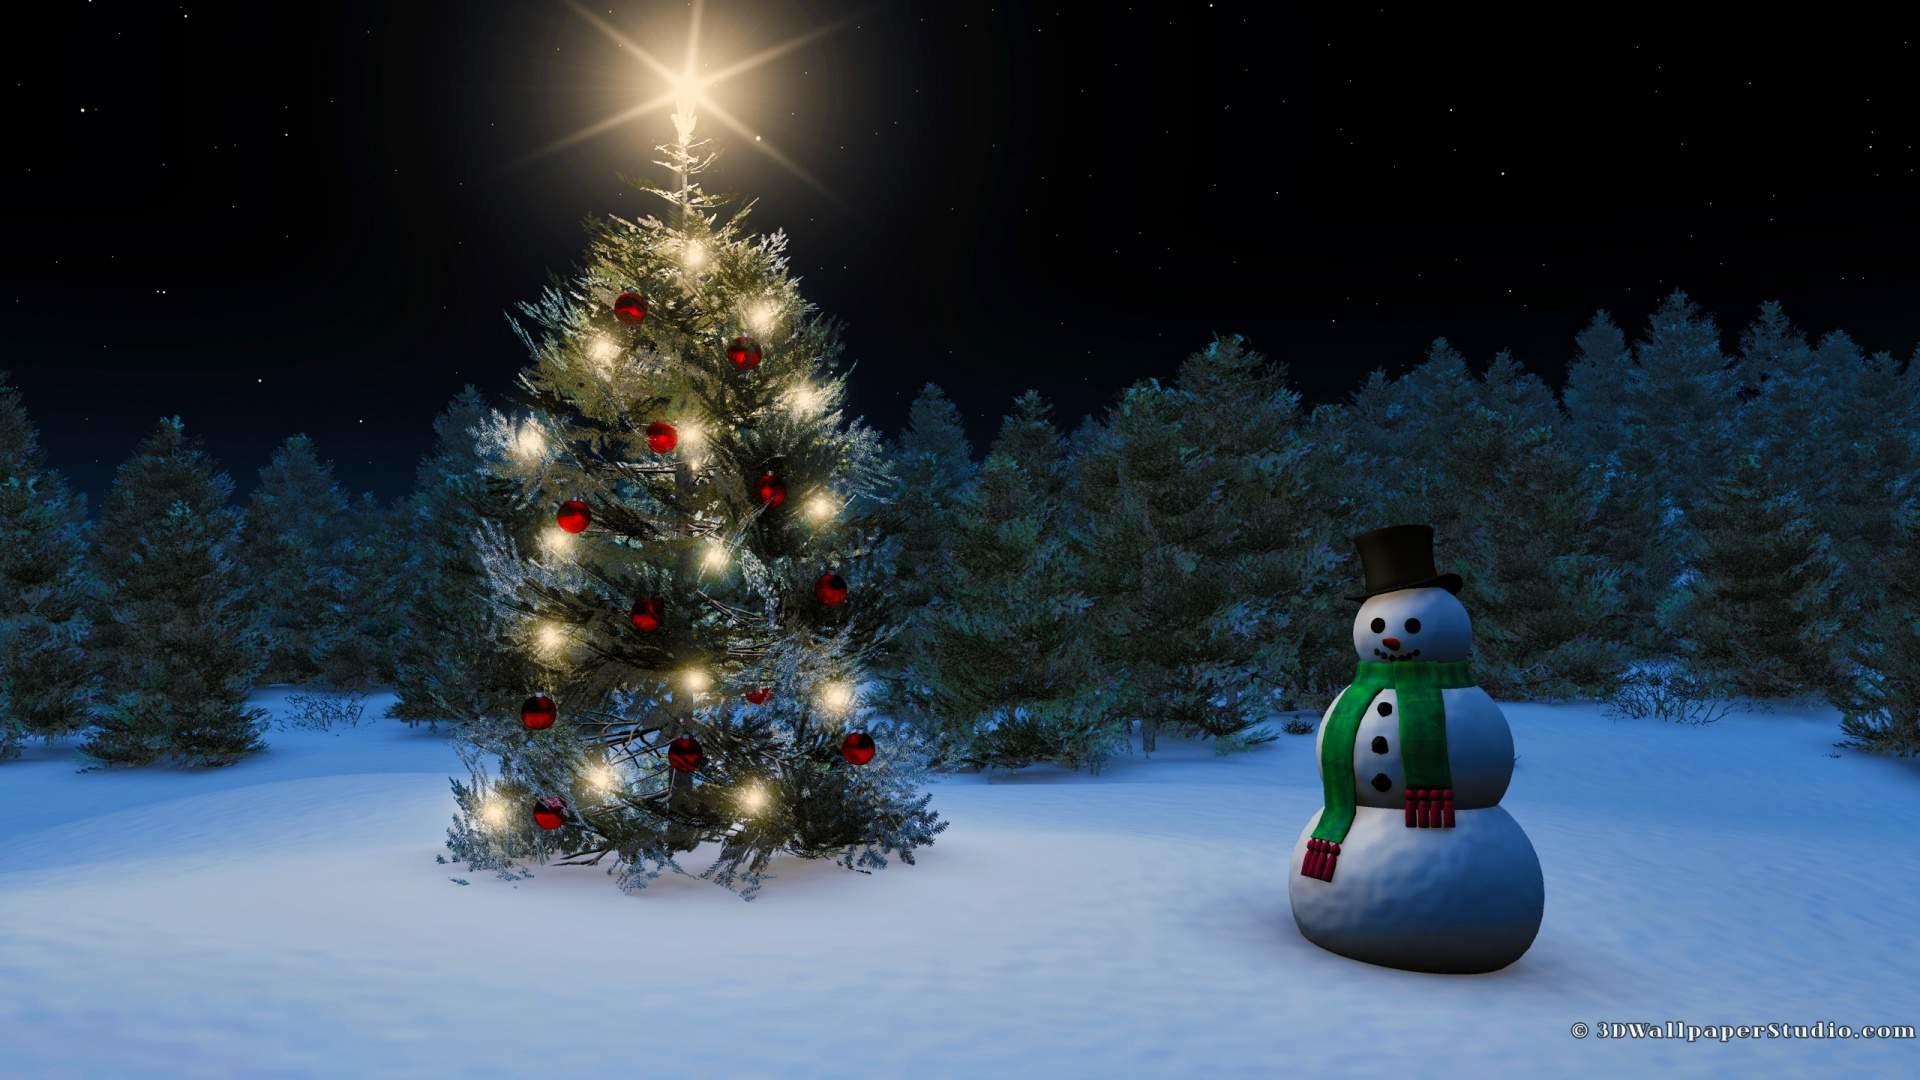 … Christmas Wallpaper 25; Christmas Wallpaper 26